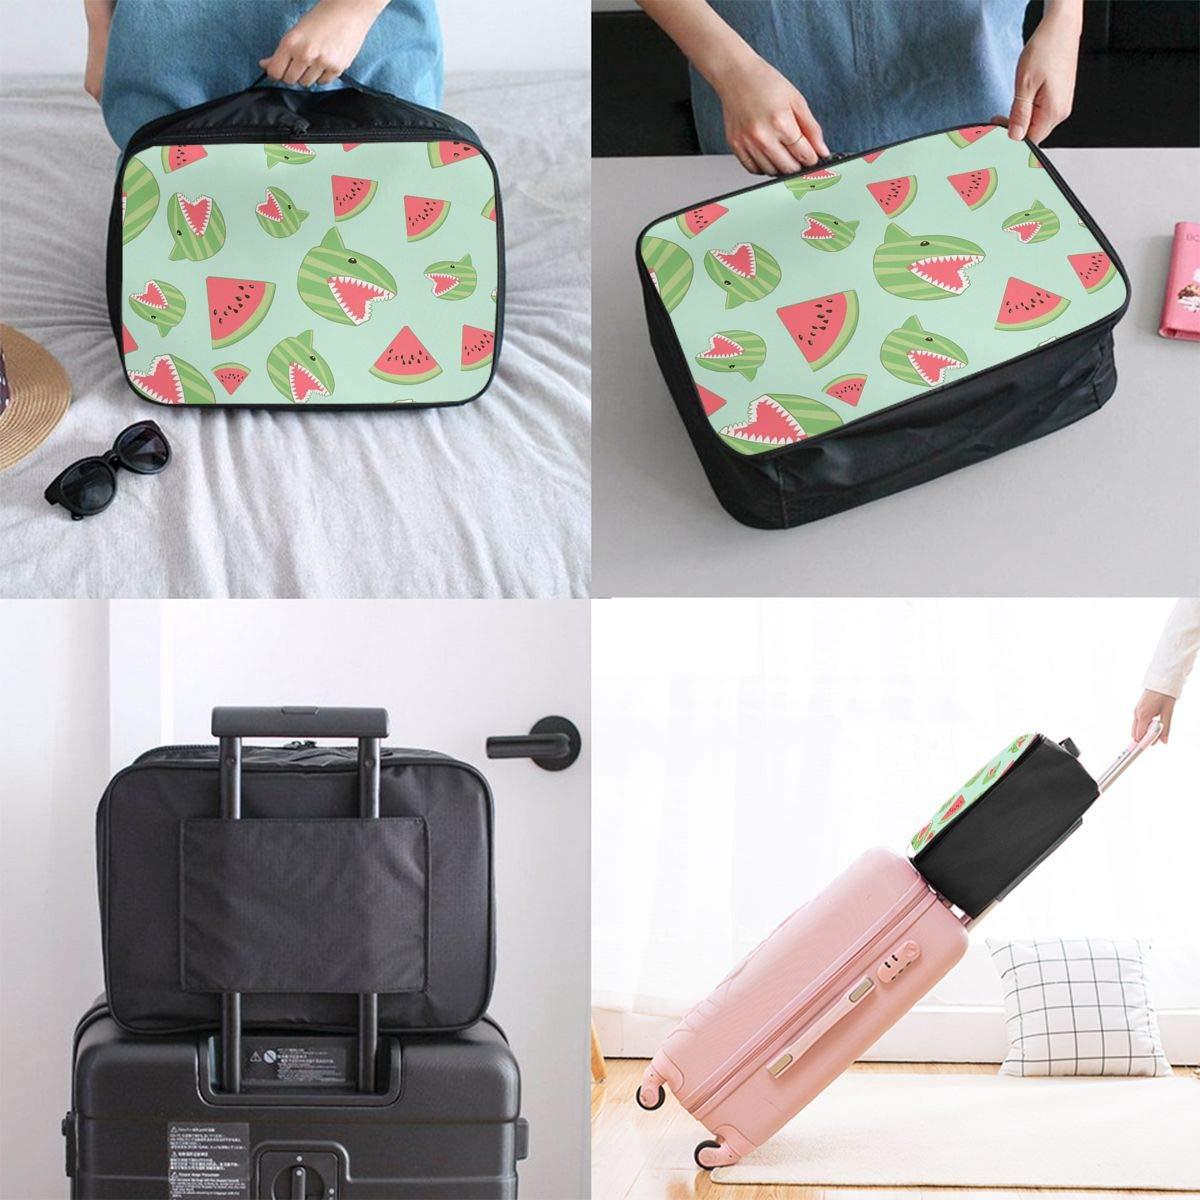 YueLJB Watermelon Shark Lightweight Large Capacity Portable Luggage Bag Travel Duffel Bag Storage Carry Luggage Duffle Tote Bag